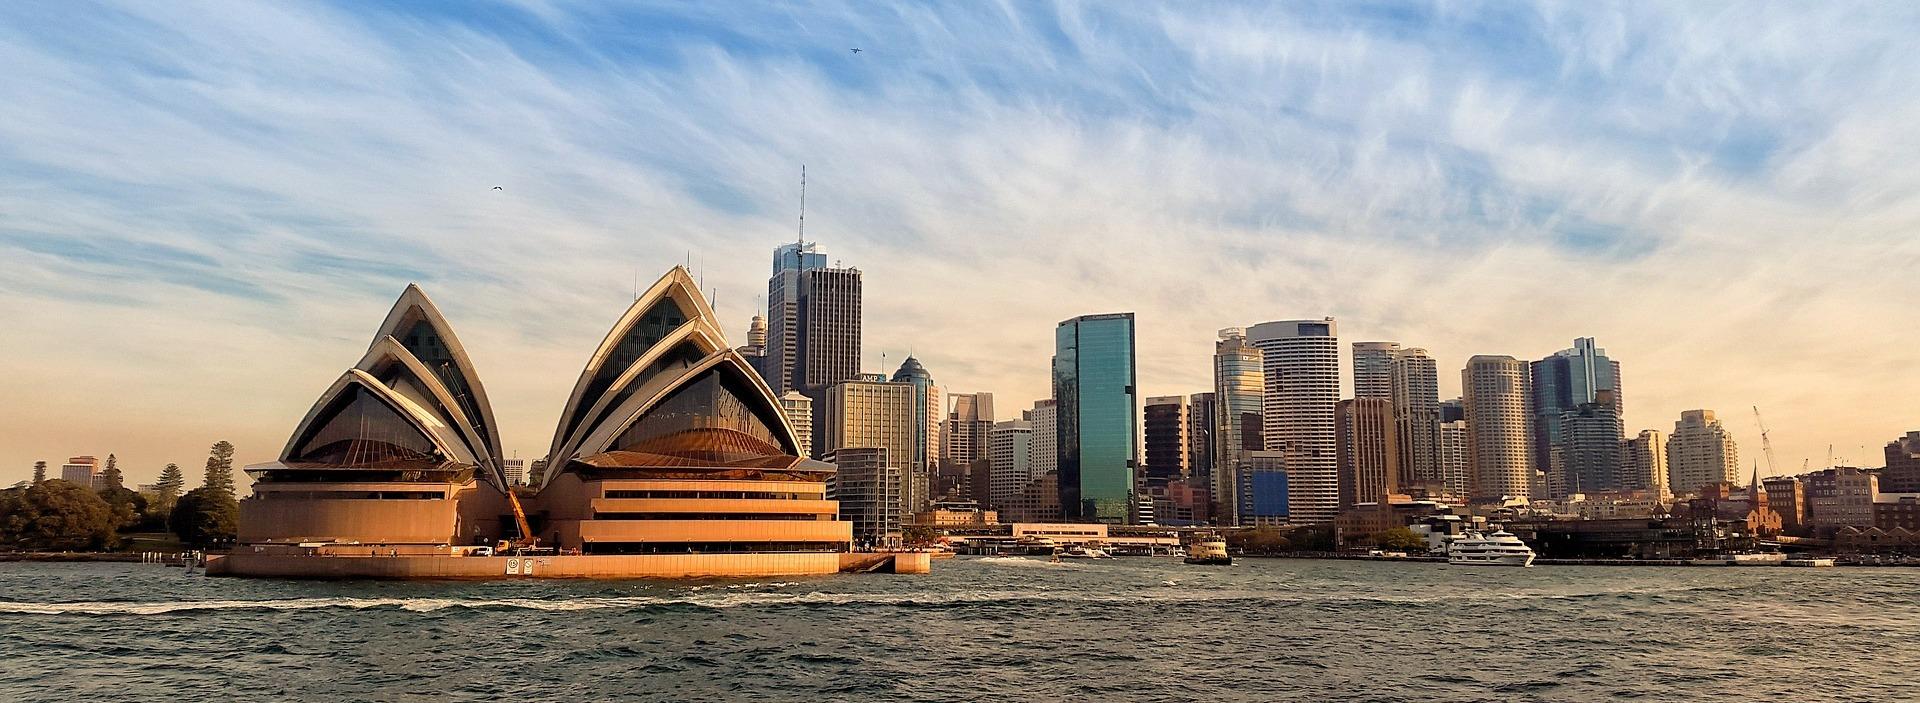 Autotransport Australien Fahrzeugtransport